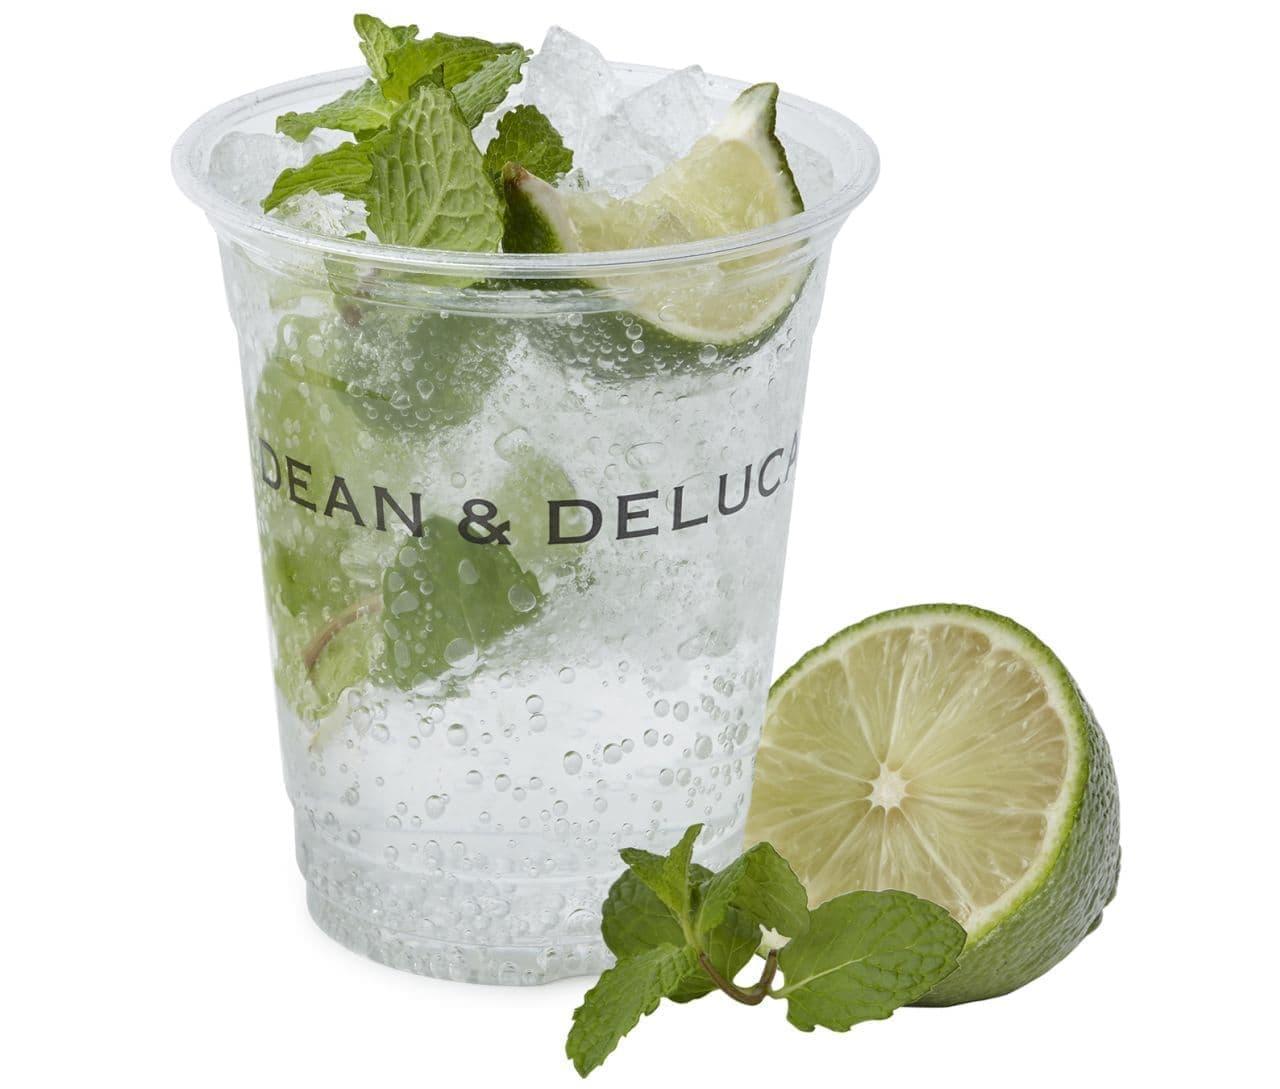 DEAN&DELUCA「HERBS&FRUITS 初夏のフレッシュソーダ」